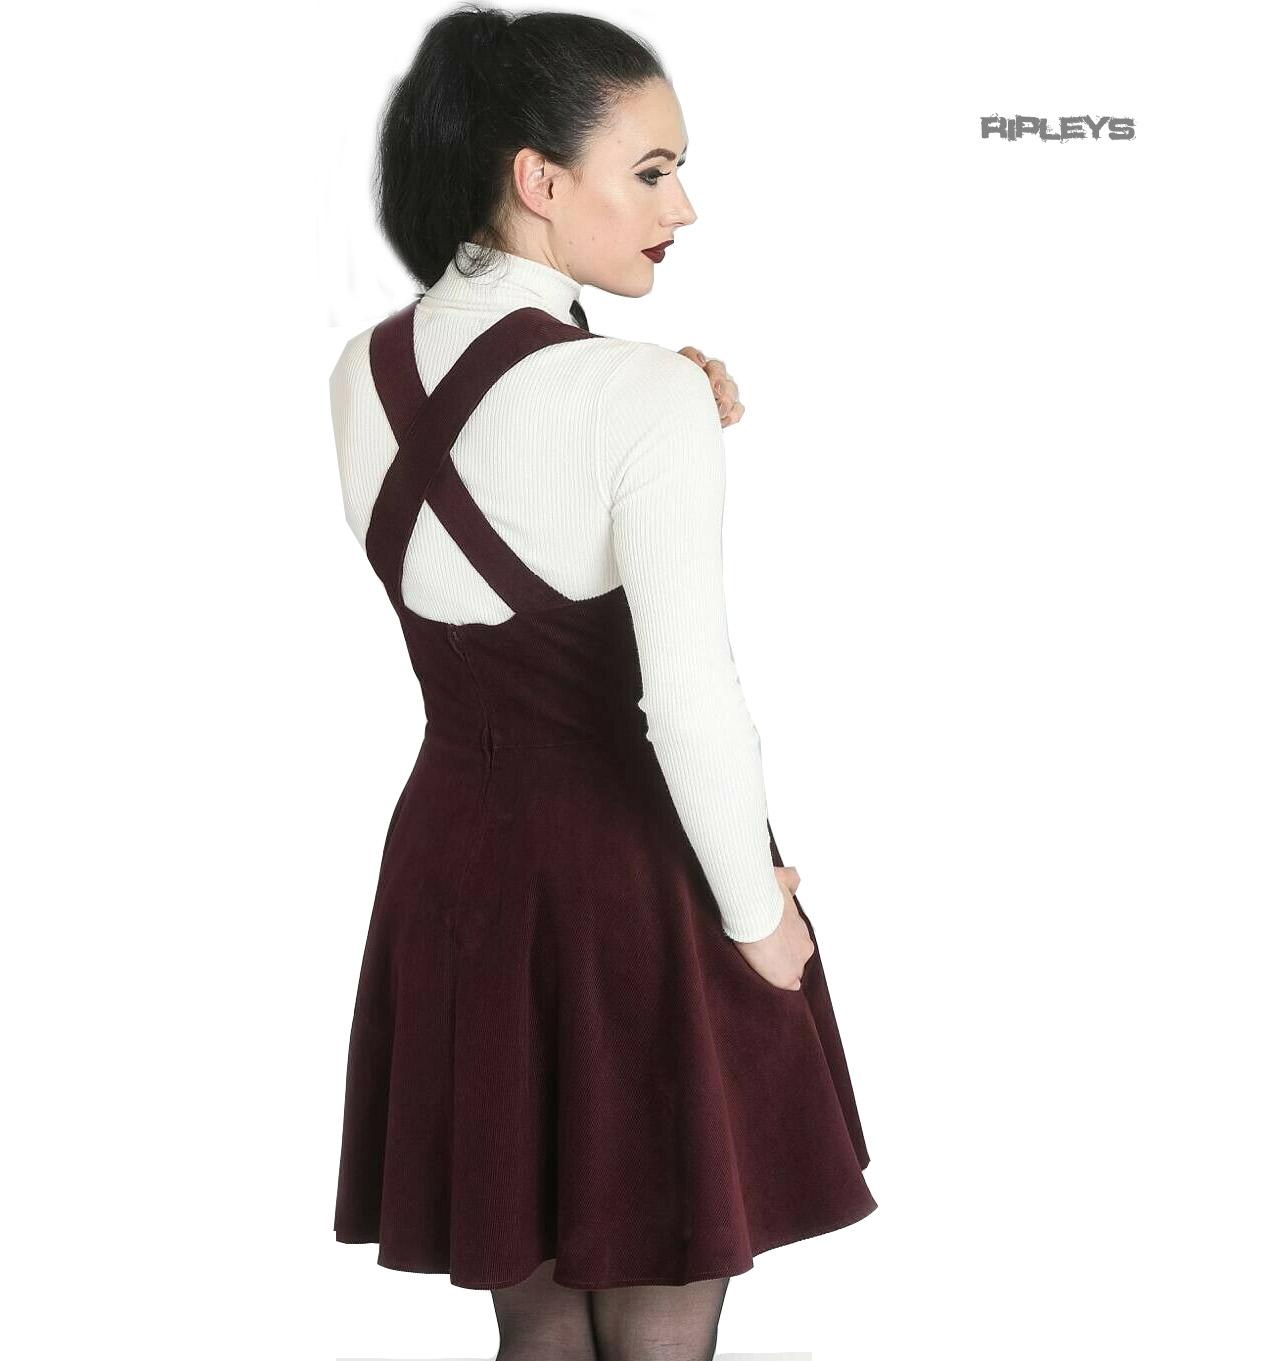 Hell-Bunny-Rockabilly-Corduroy-Mini-Dress-WONDER-YEARS-Pinafore-Wine-All-Sizes thumbnail 20